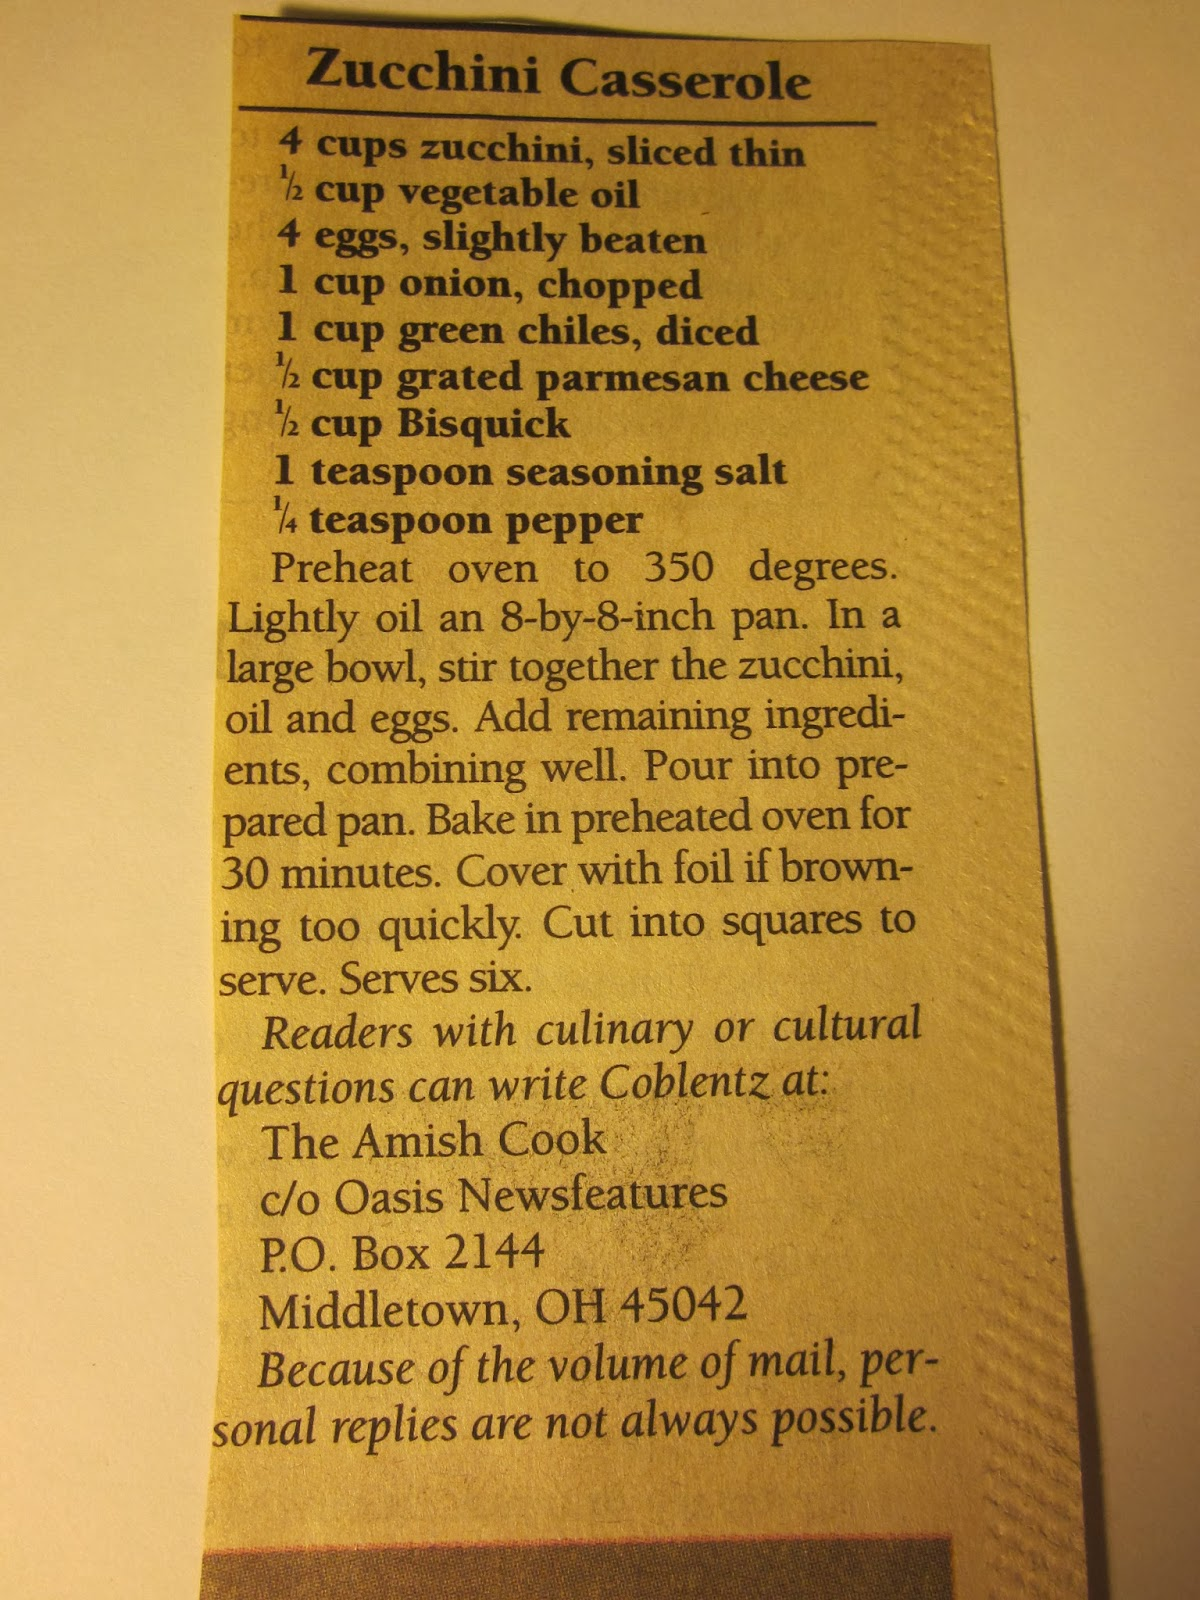 amish zucchini casserole